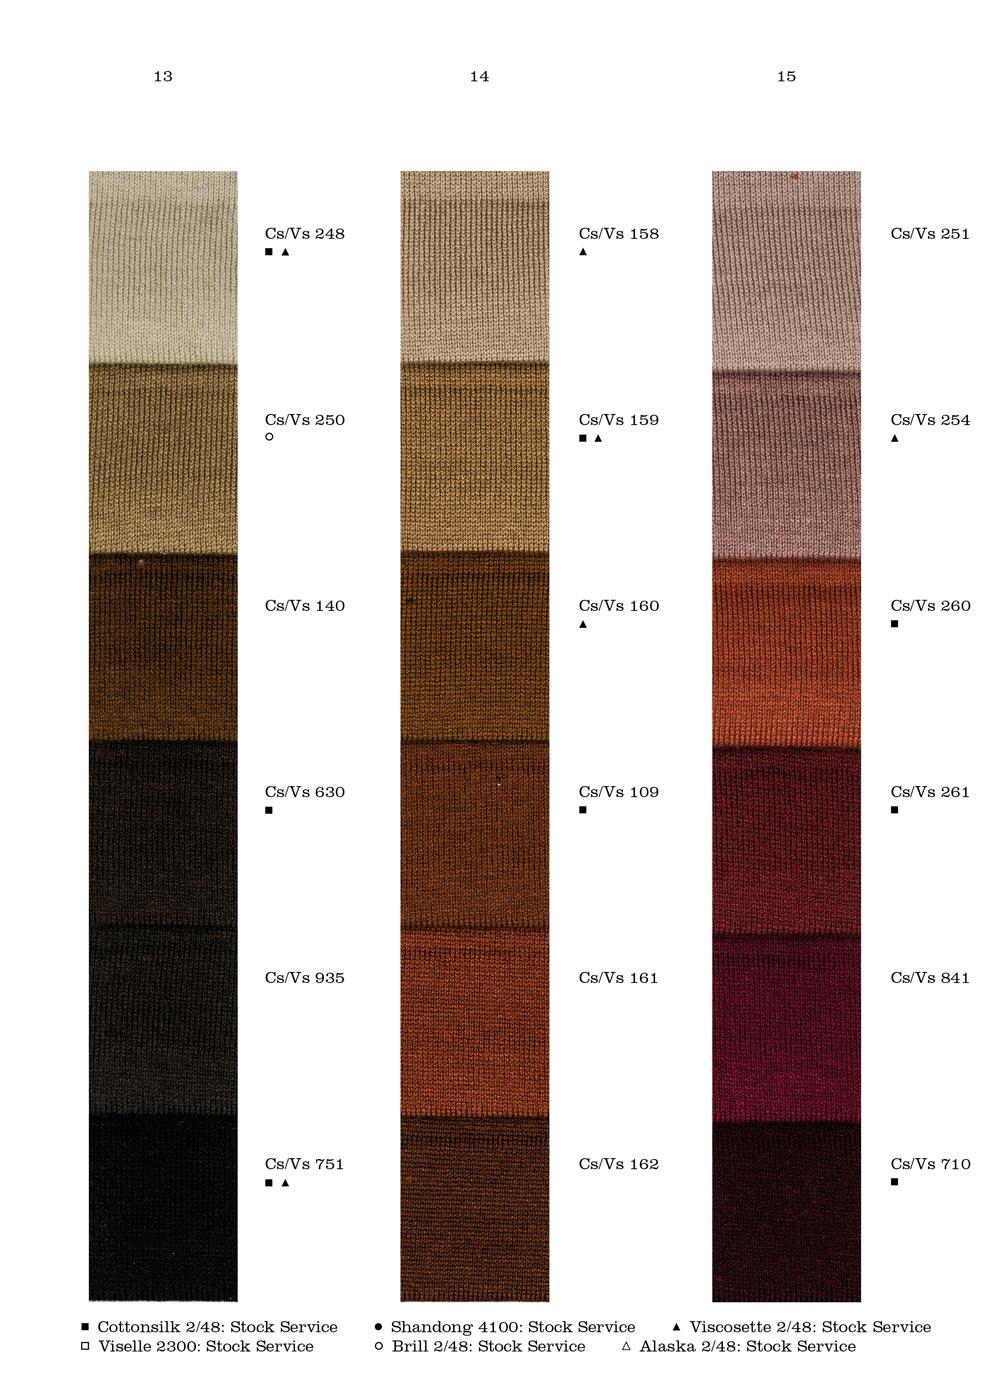 SeS_PE-22_Cottonsilk-Shandong-Viscosette-Viselle12